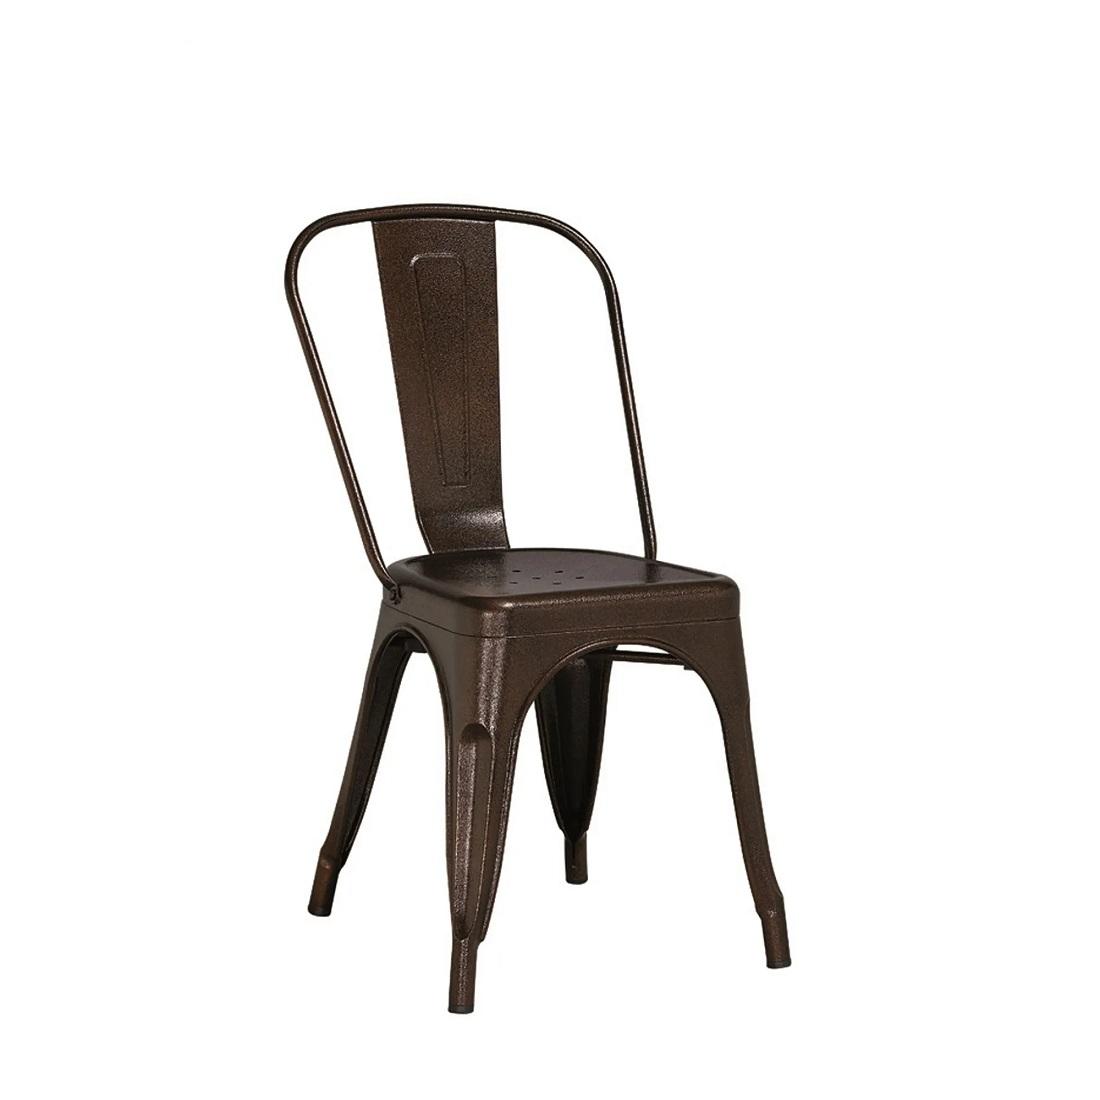 Cadeira Design Tolix Bronze Industrial Vintage Metal - Orb